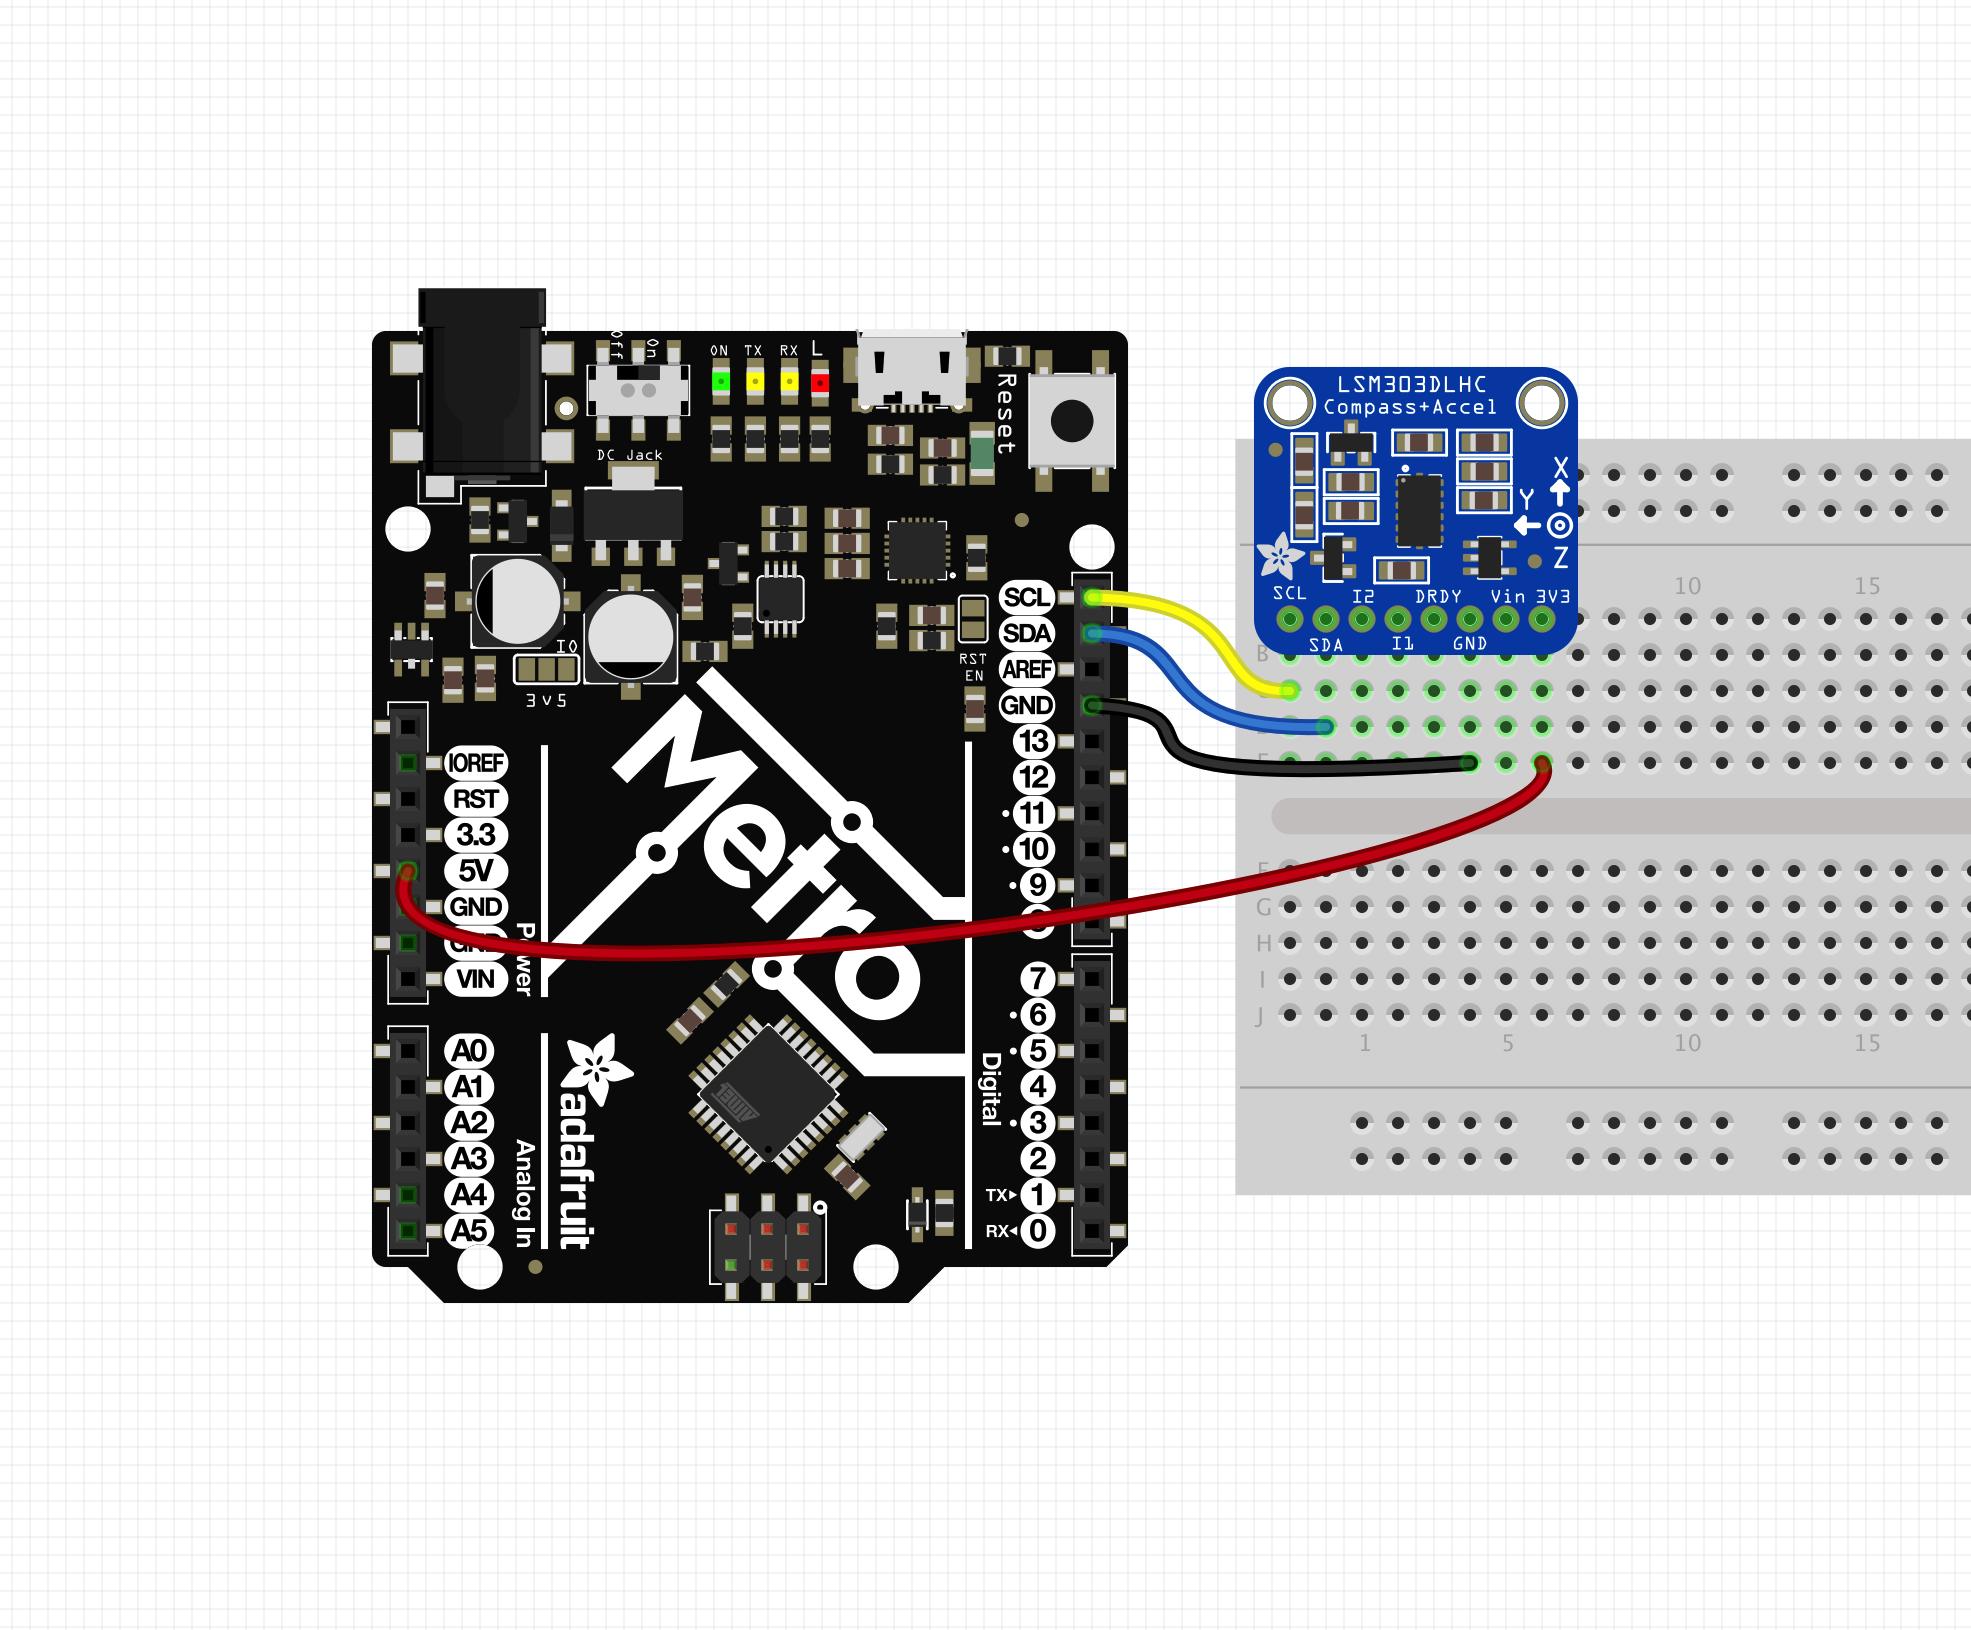 robotics___cnc_arduino_DLH_bb.png